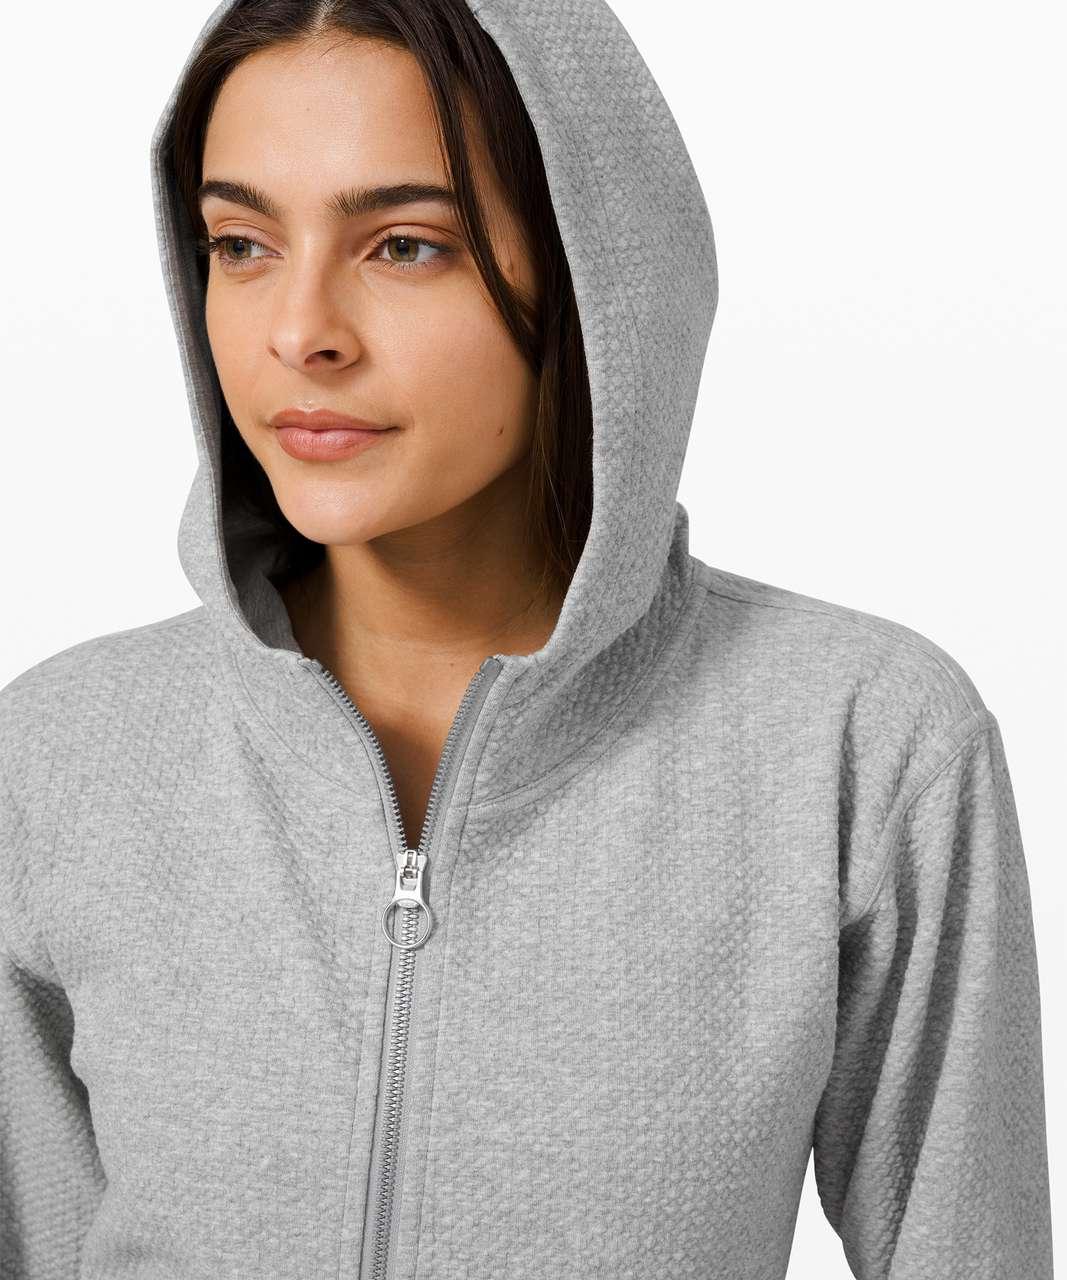 Lululemon All Yours Zip Hoodie *Bubble Dot - Heathered Core Light Grey / White